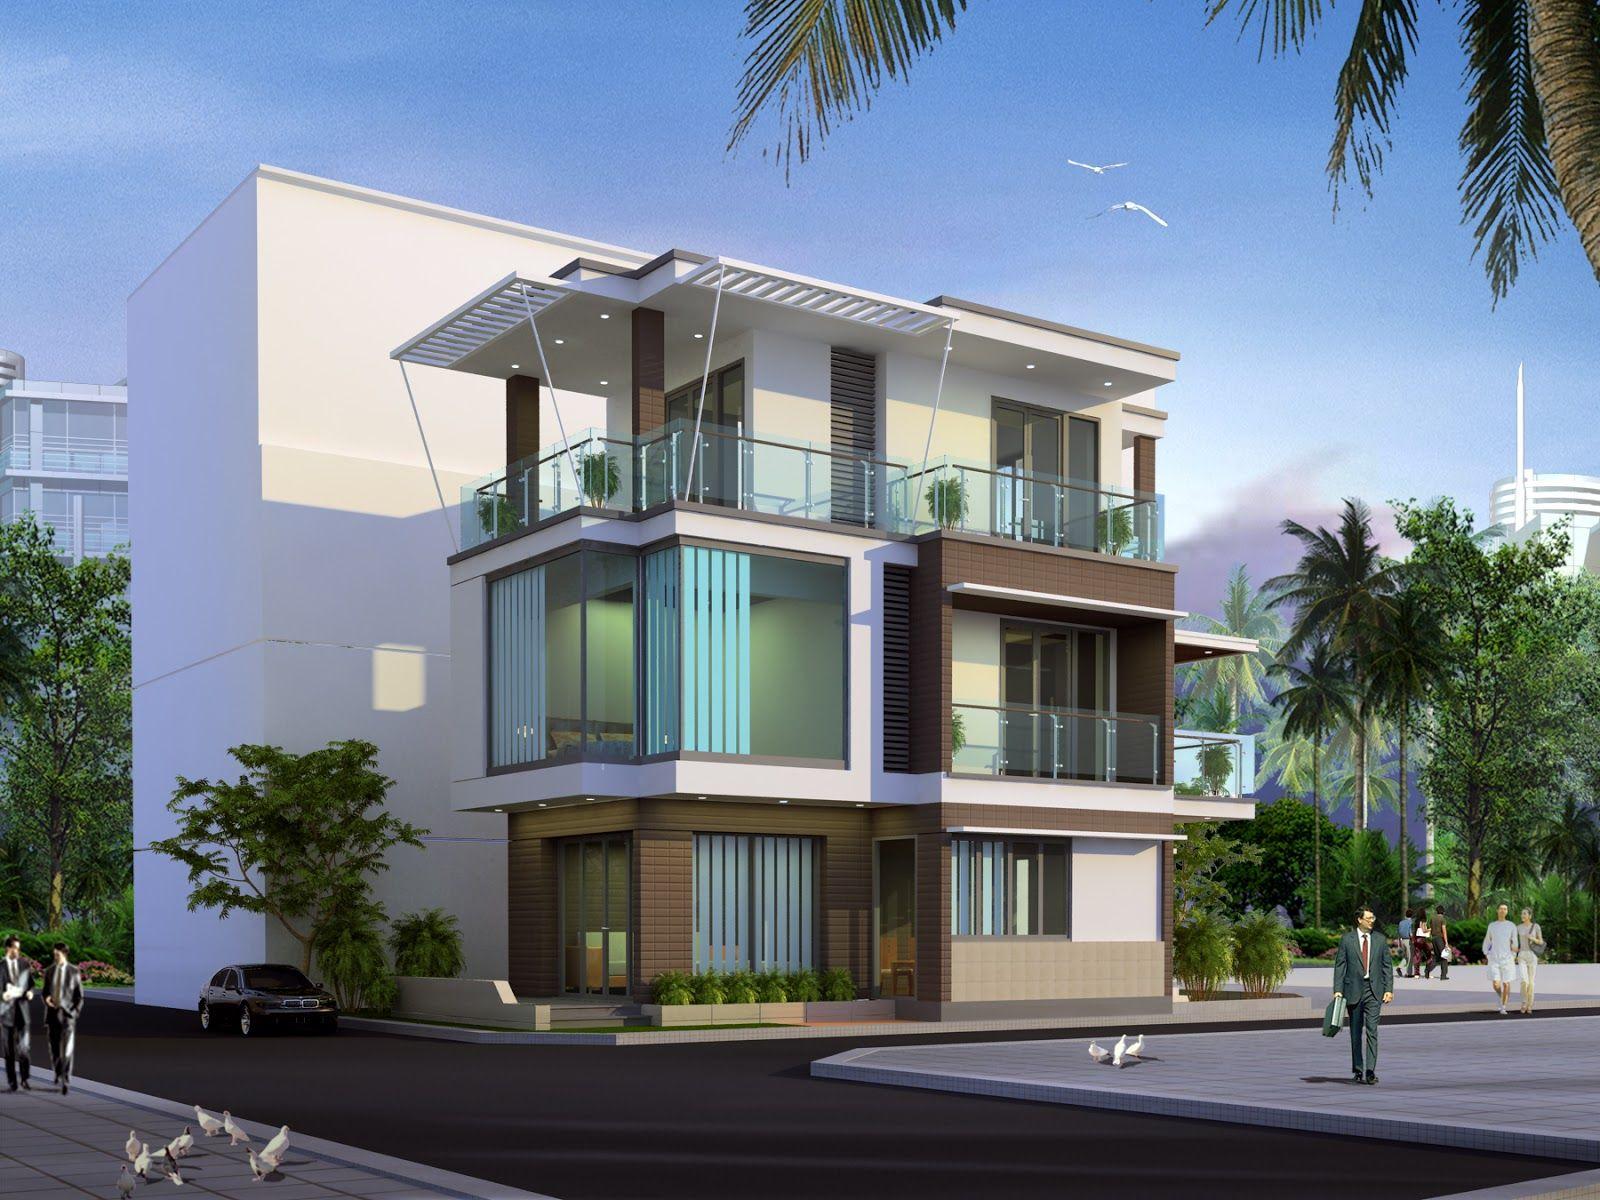 3D Exteriors Villa 6 Model 3dsmax by Mr Thuong Free Download